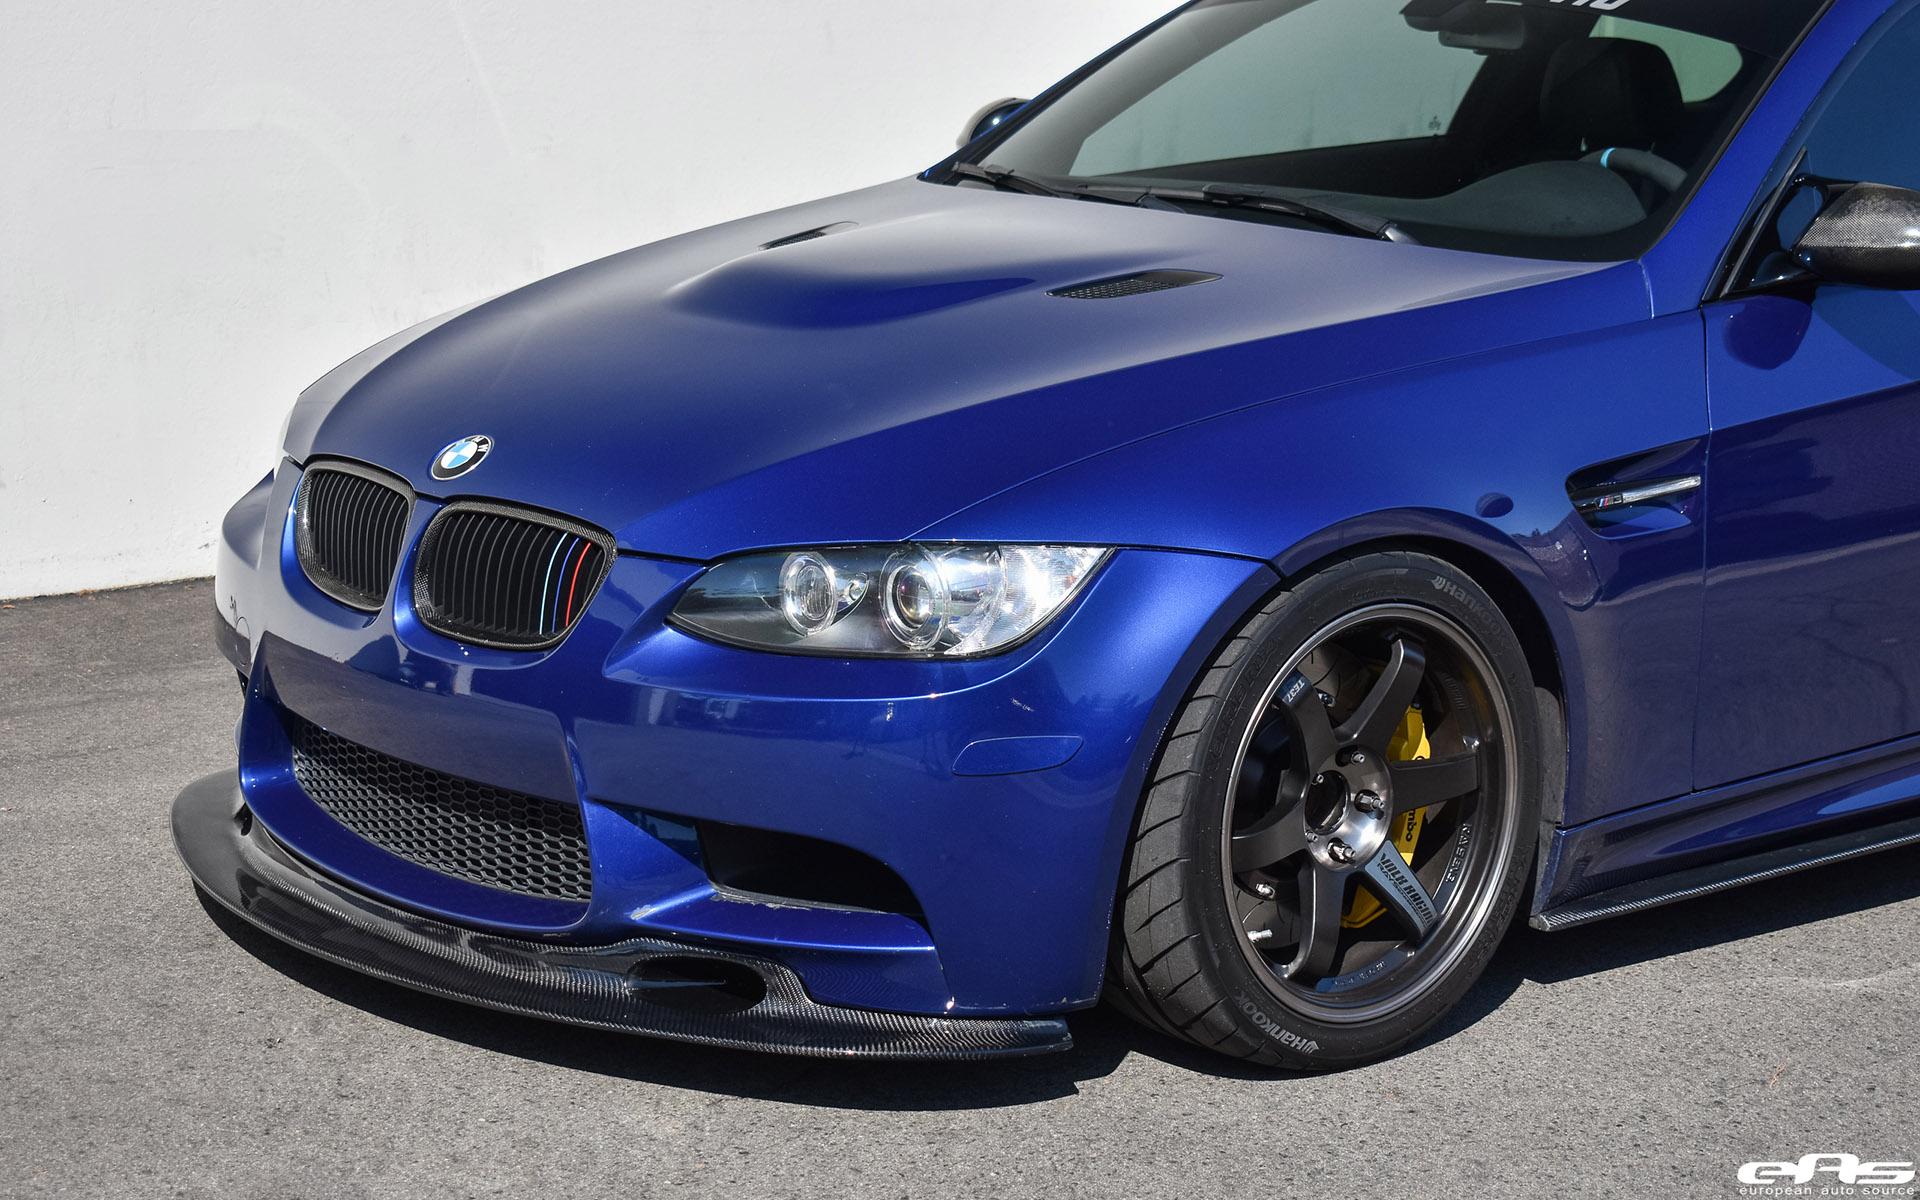 BMW M3 E92 by European Auto Source